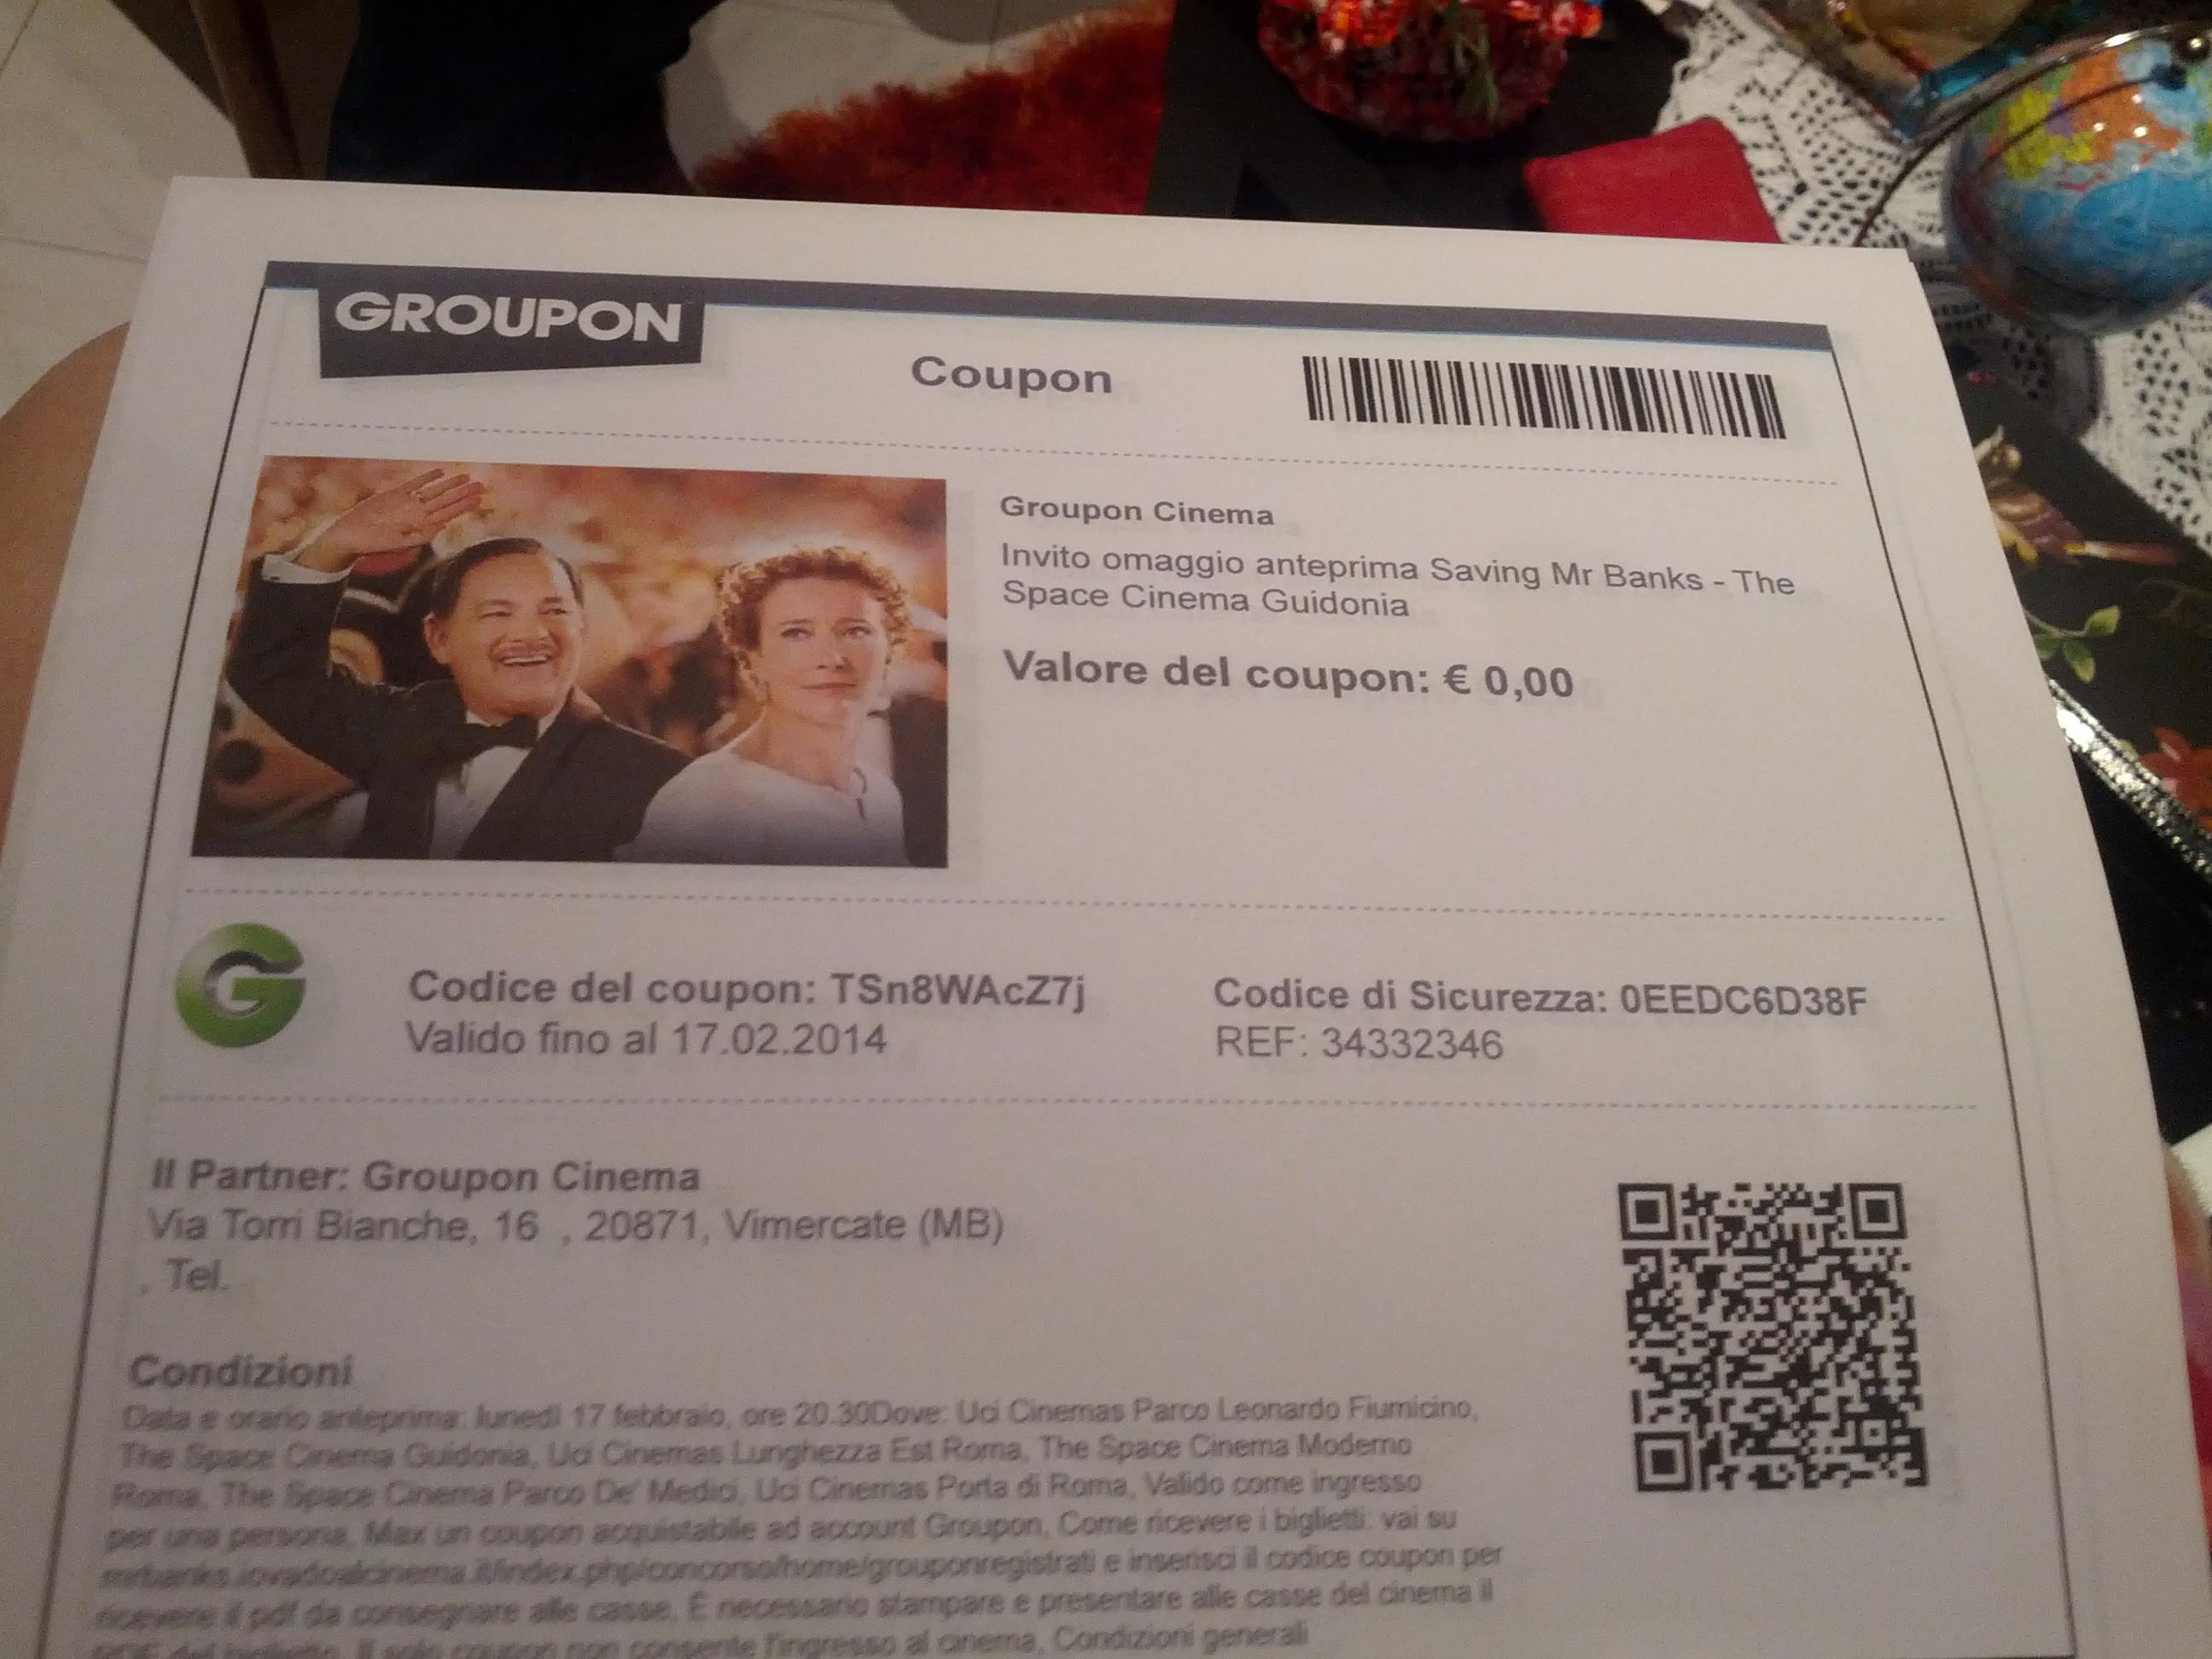 campioniomaggio.it_2014-02-12_20-29-22